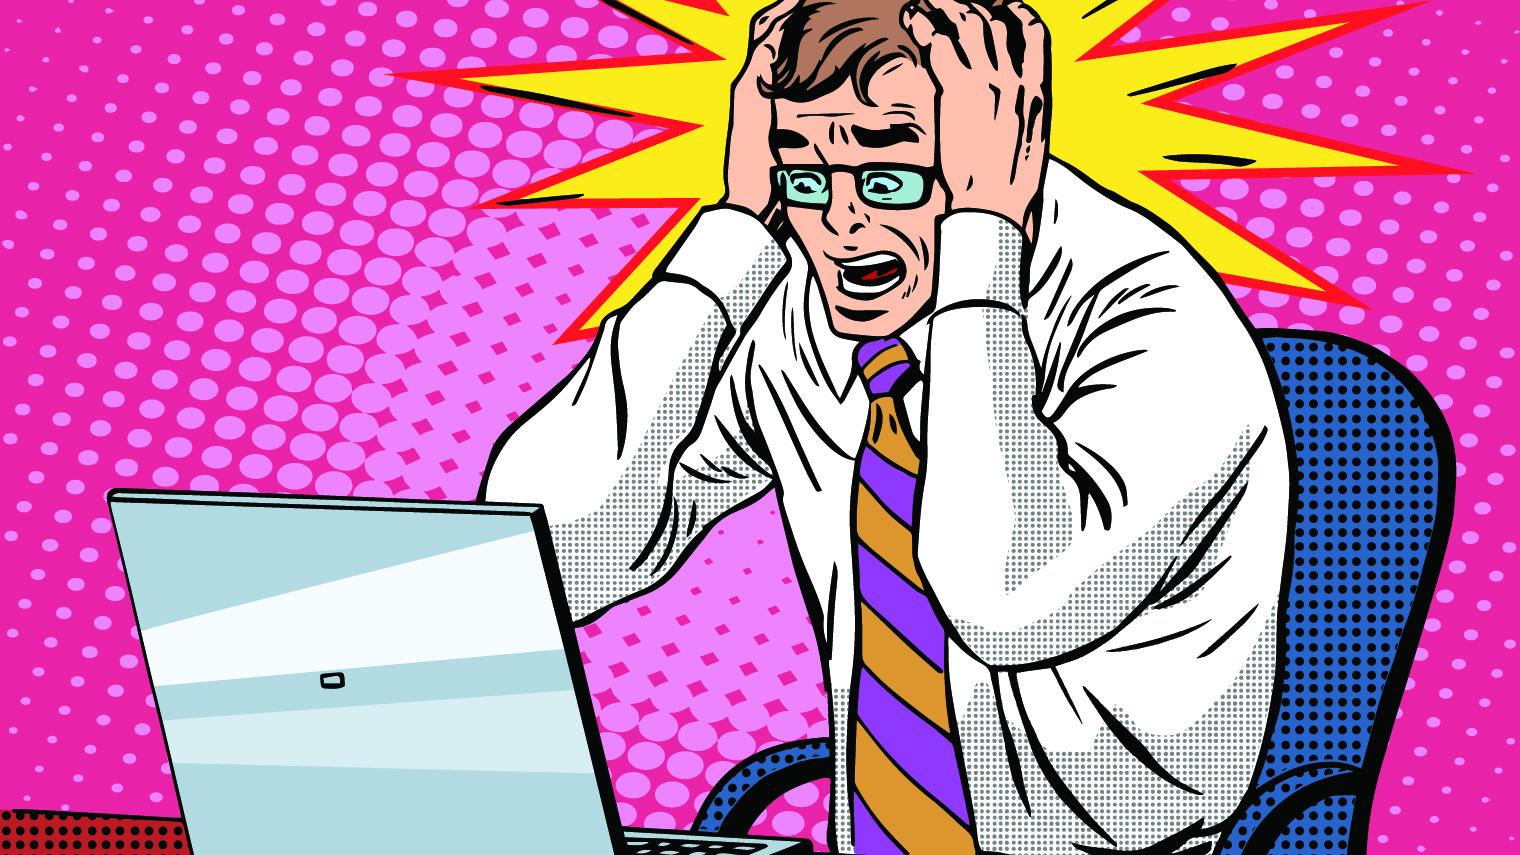 Pop art image of a man at a computer